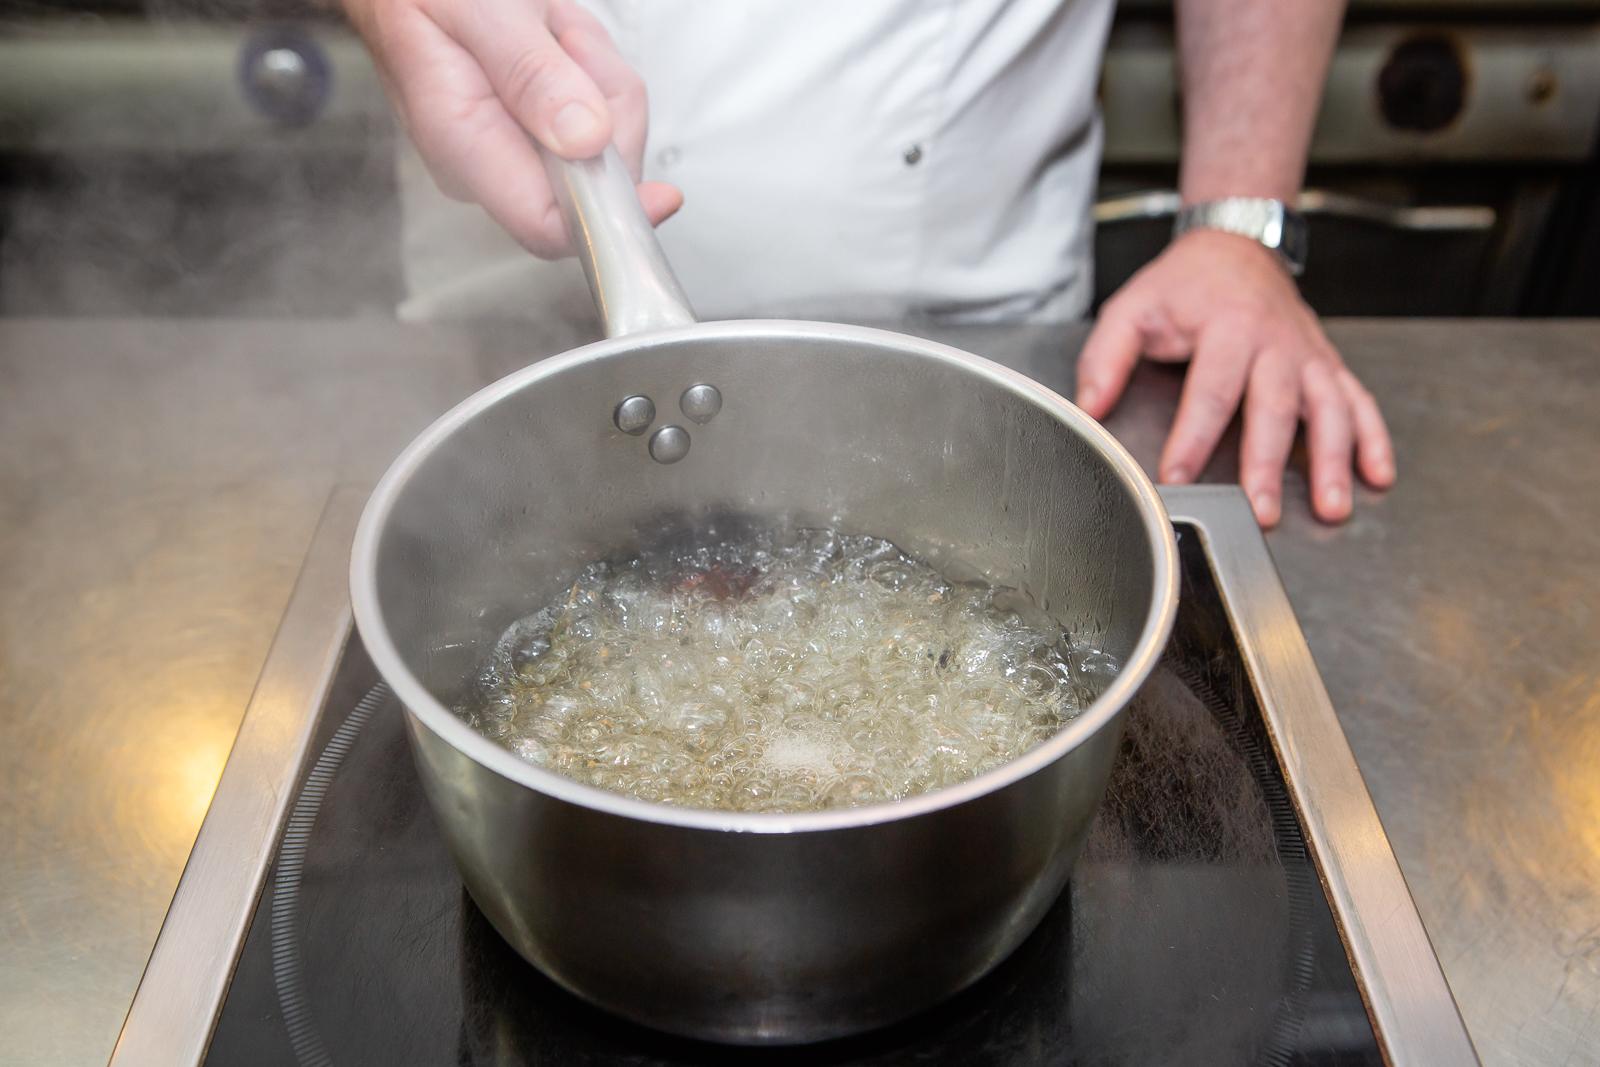 STEP THREE - Boil until all the sugar has dissolved.